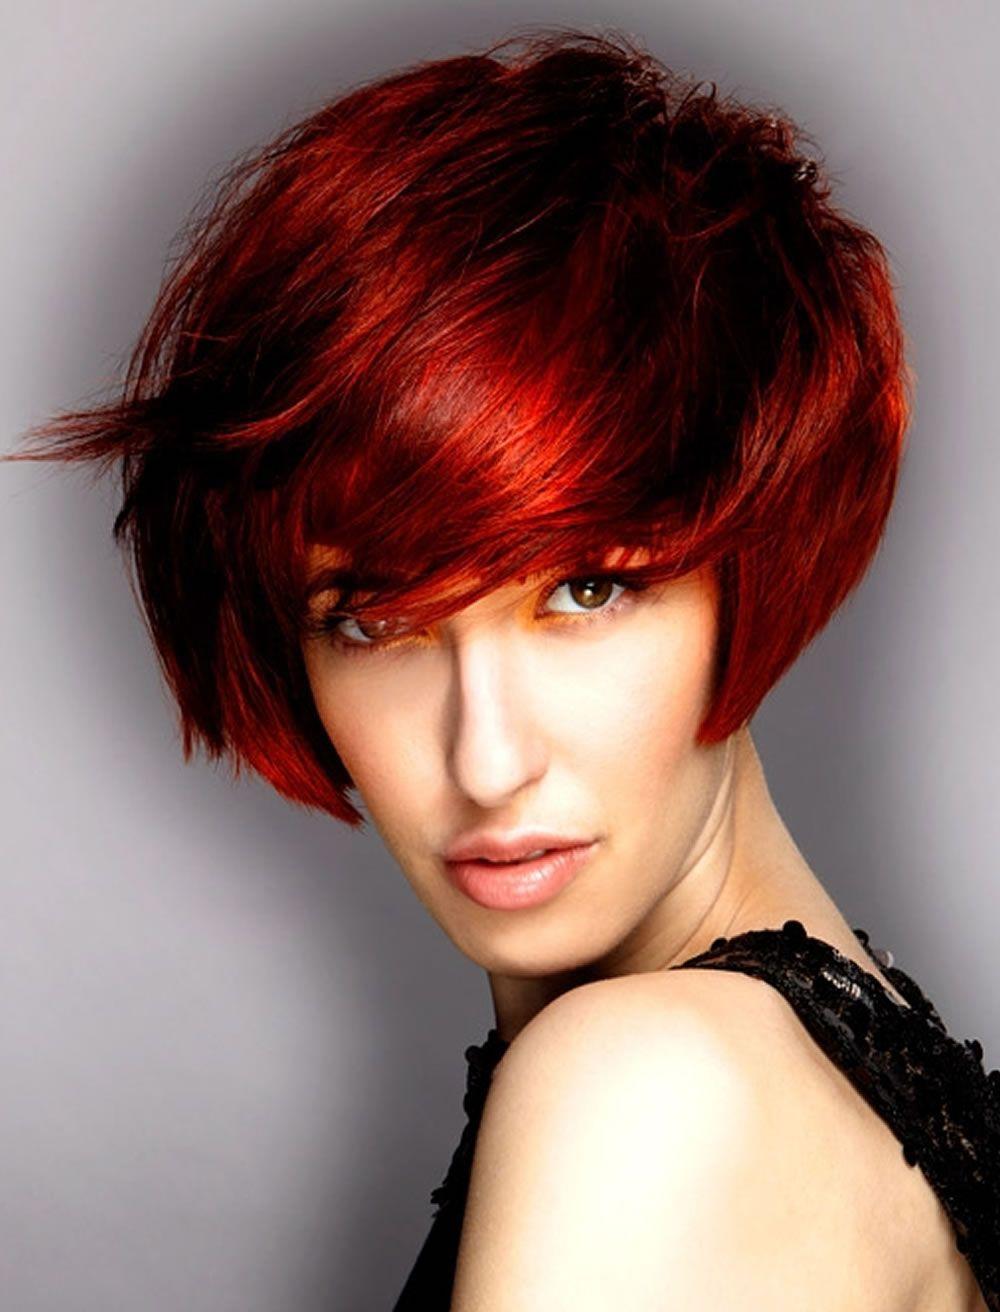 Rote Haarfarbe für kurze Frisuren Cooles Haarschnitt